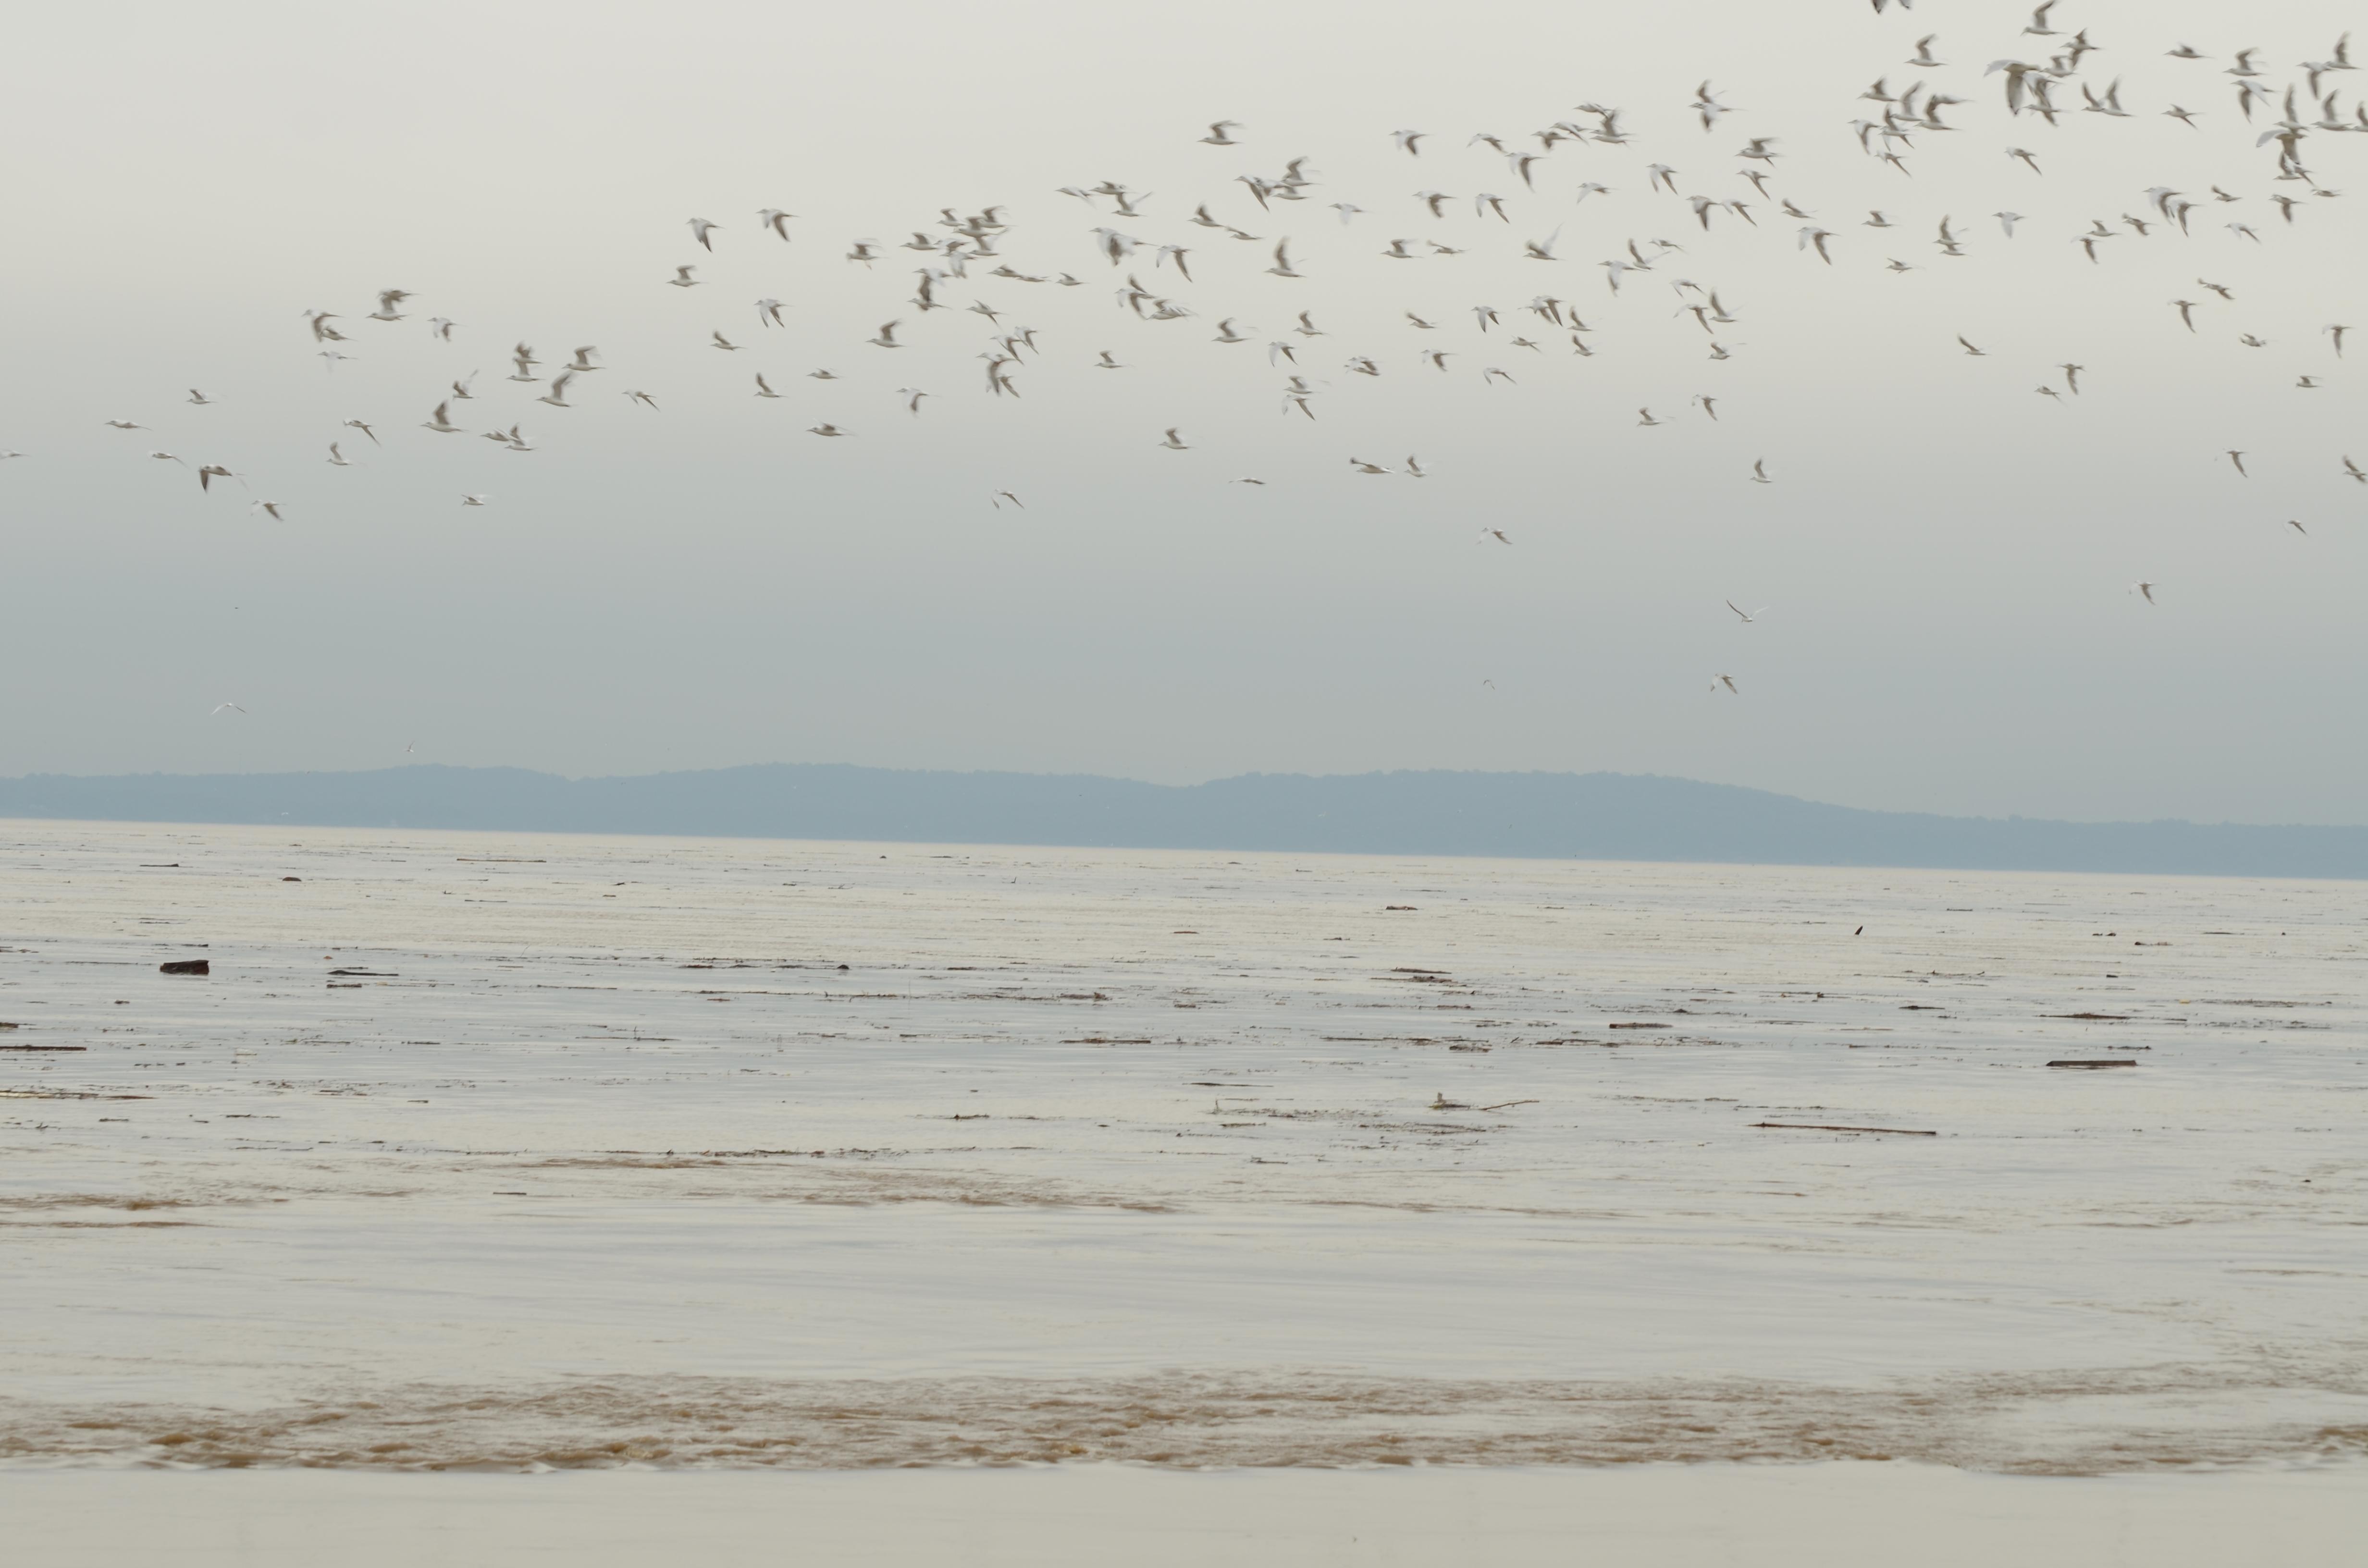 view летний поход совёнка серия 11 вып 1